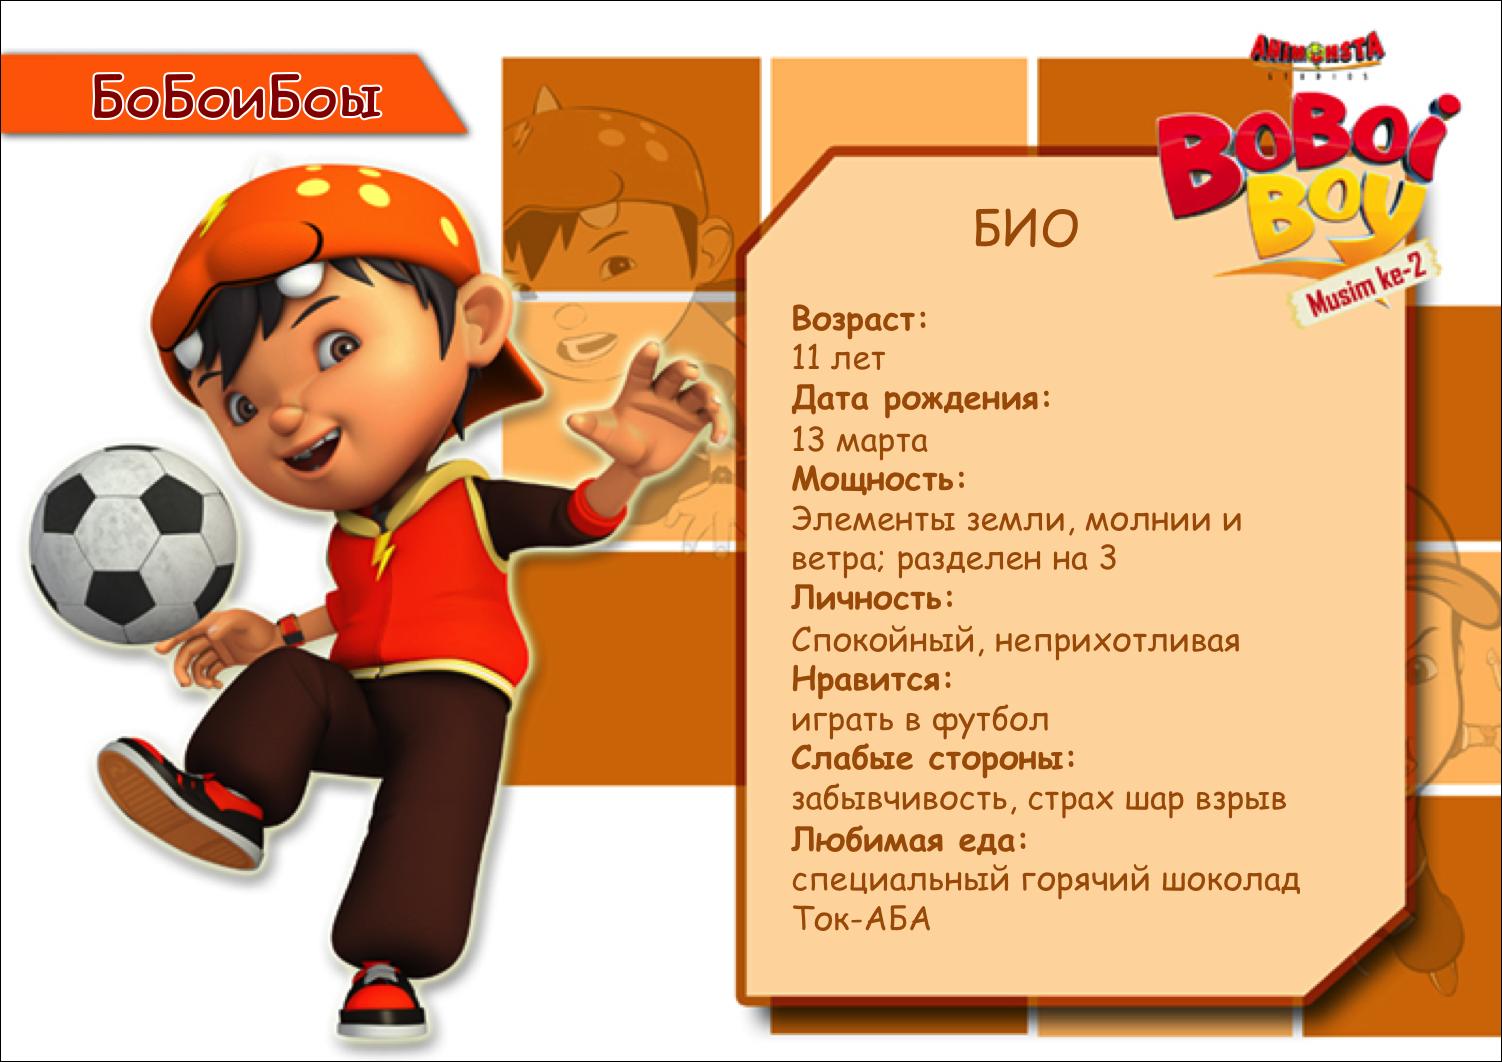 image boboiboy biodata russian png boboiboy wiki fandom